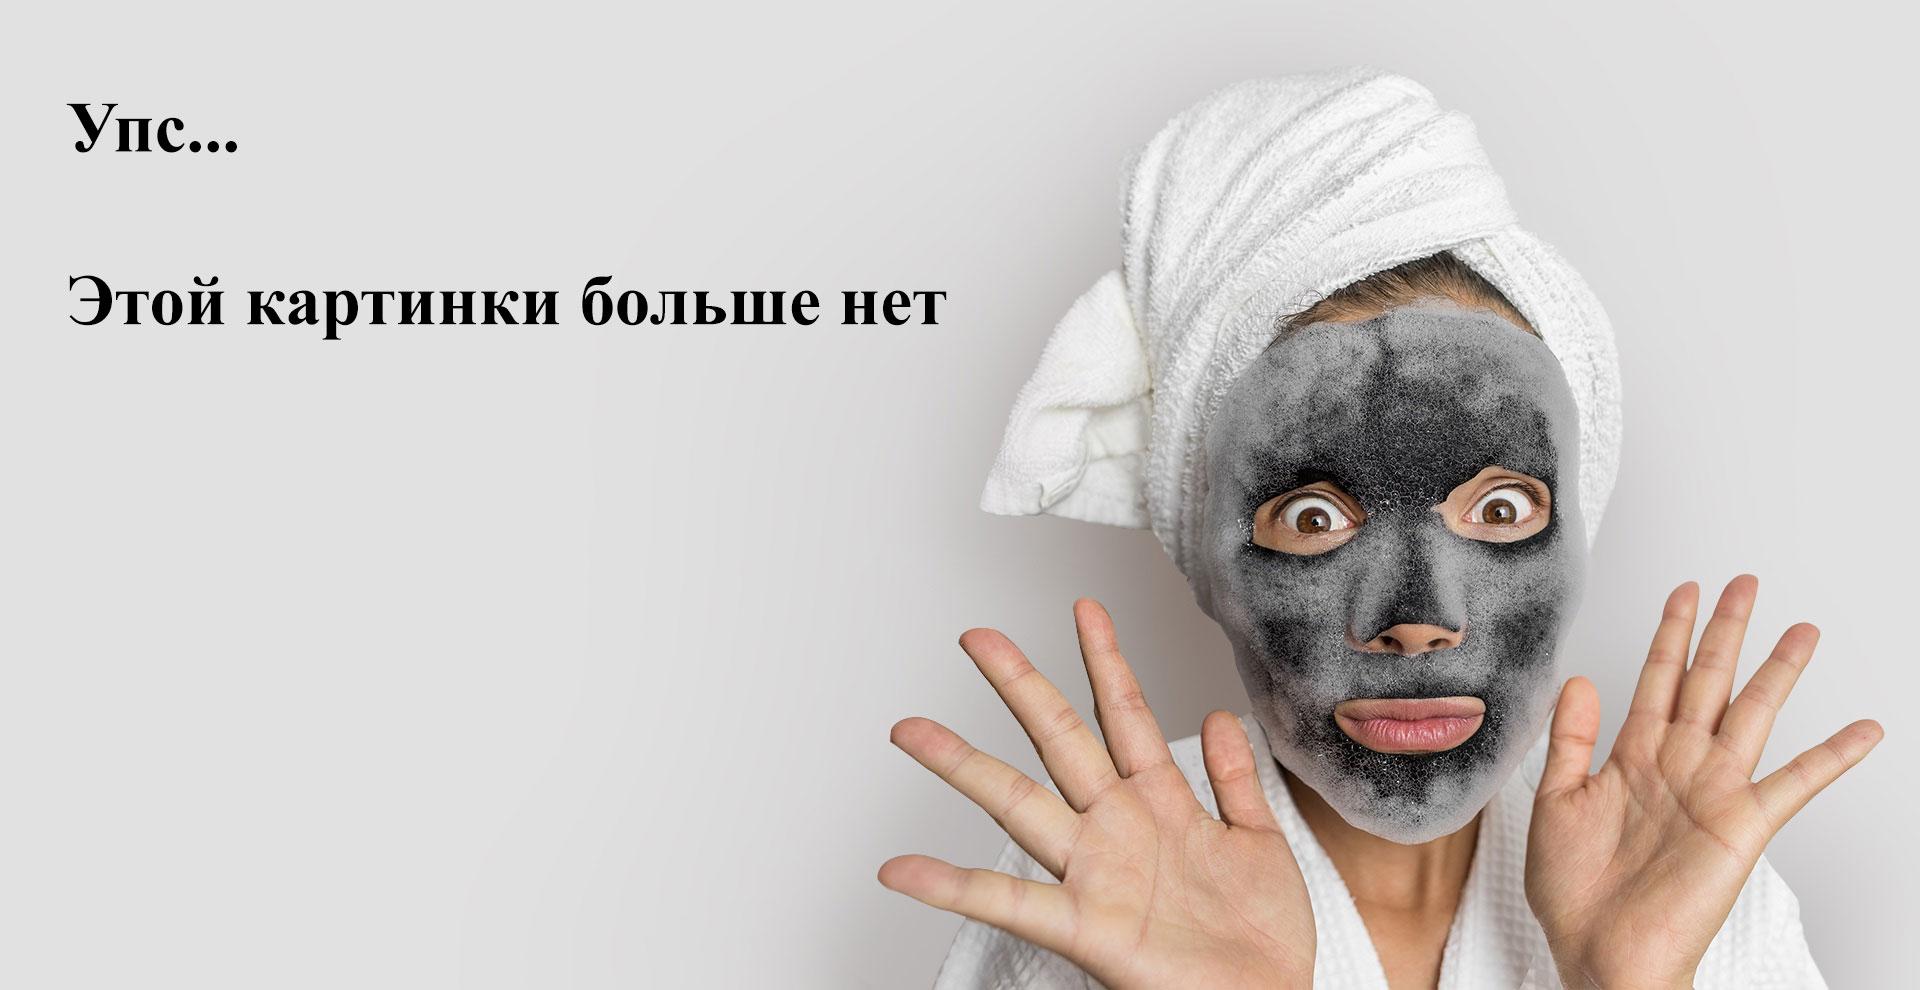 TambuSun, Молочко для тела «Тонус и эластичность», 200 мл